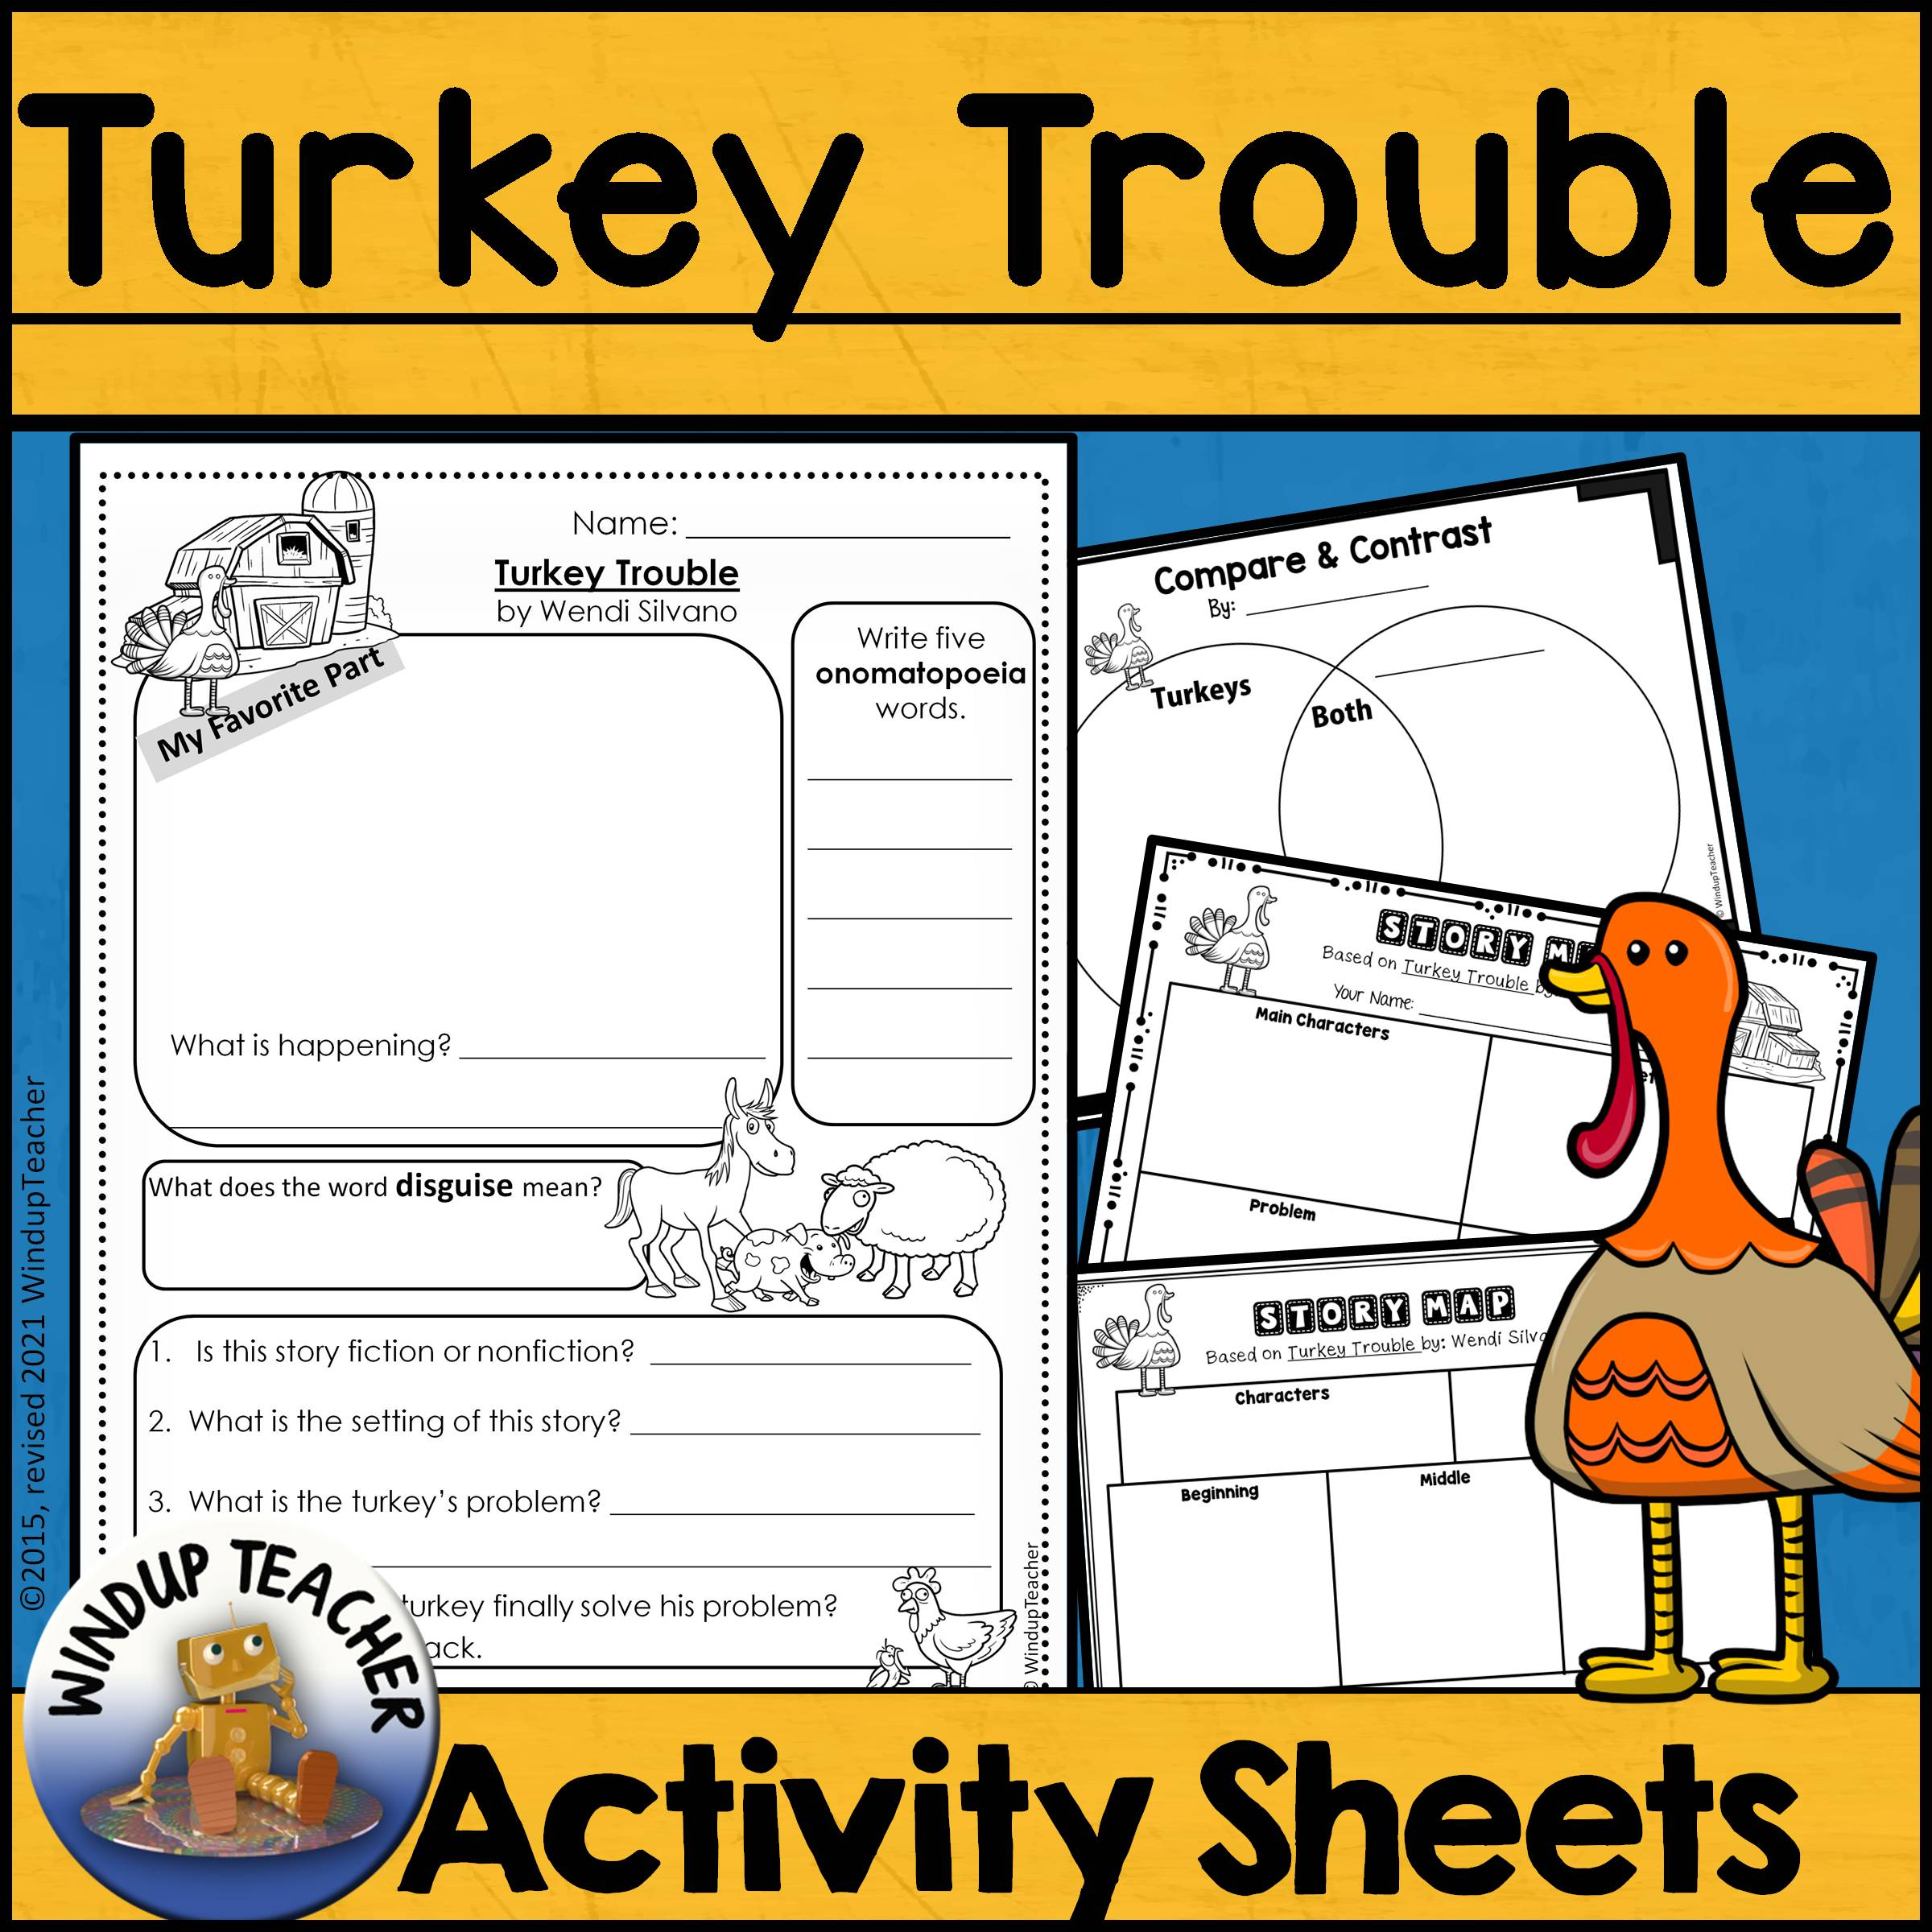 Turkey Trouble Activity Sheet | Print & Go!